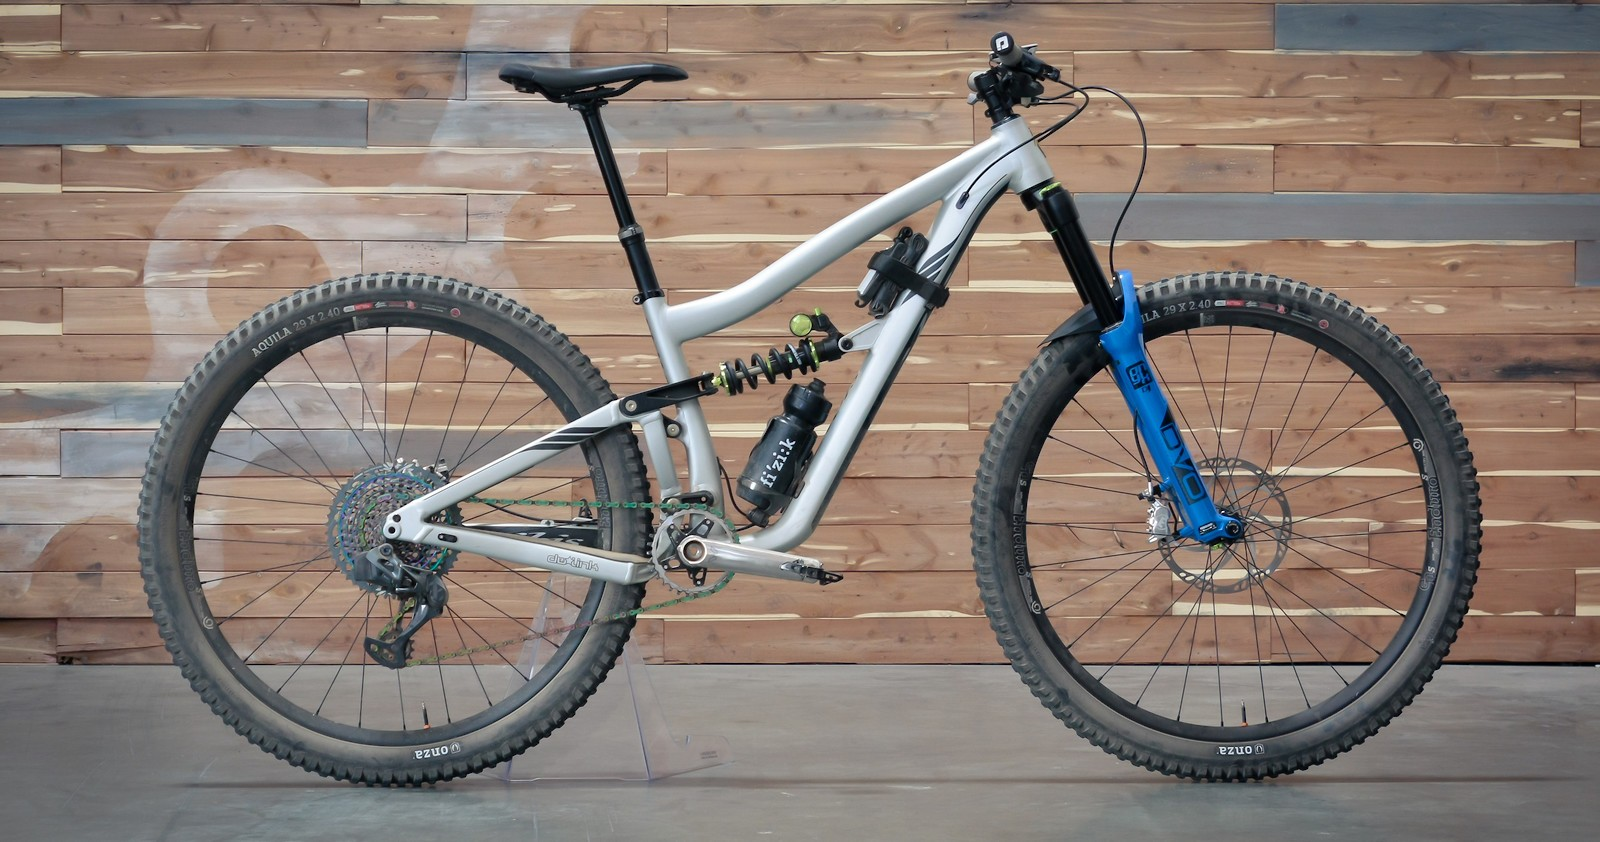 Epic IBIS Bike Builds from Vital Members - Epic IBIS Bike Builds from Vital Members - Mountain Biking Pictures - Vital MTB